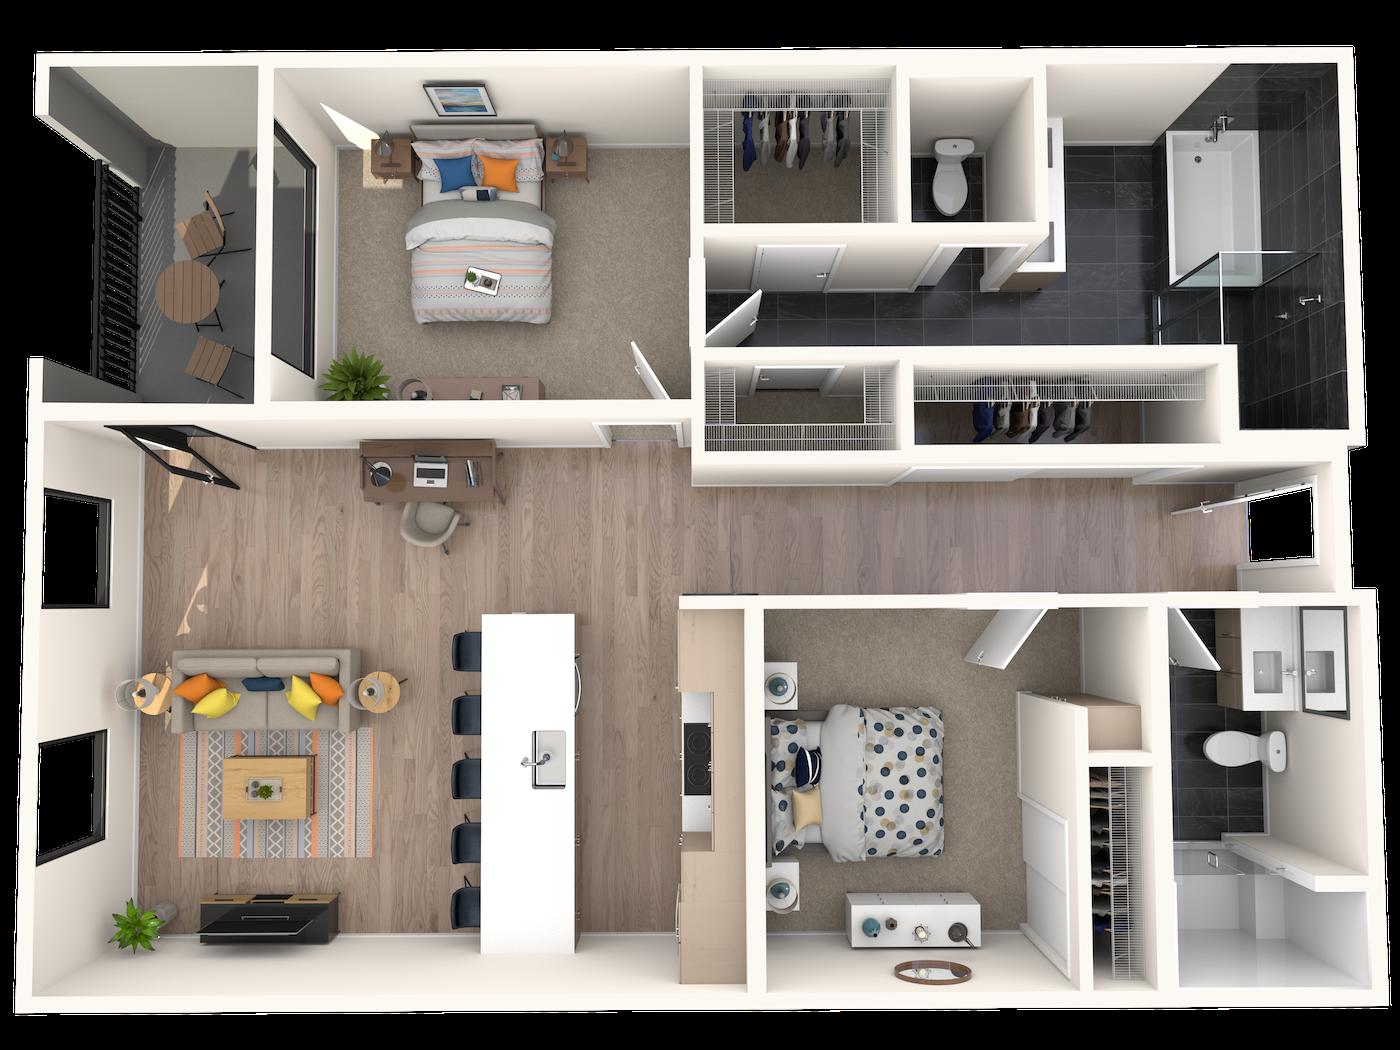 A2.3 Floor Plan